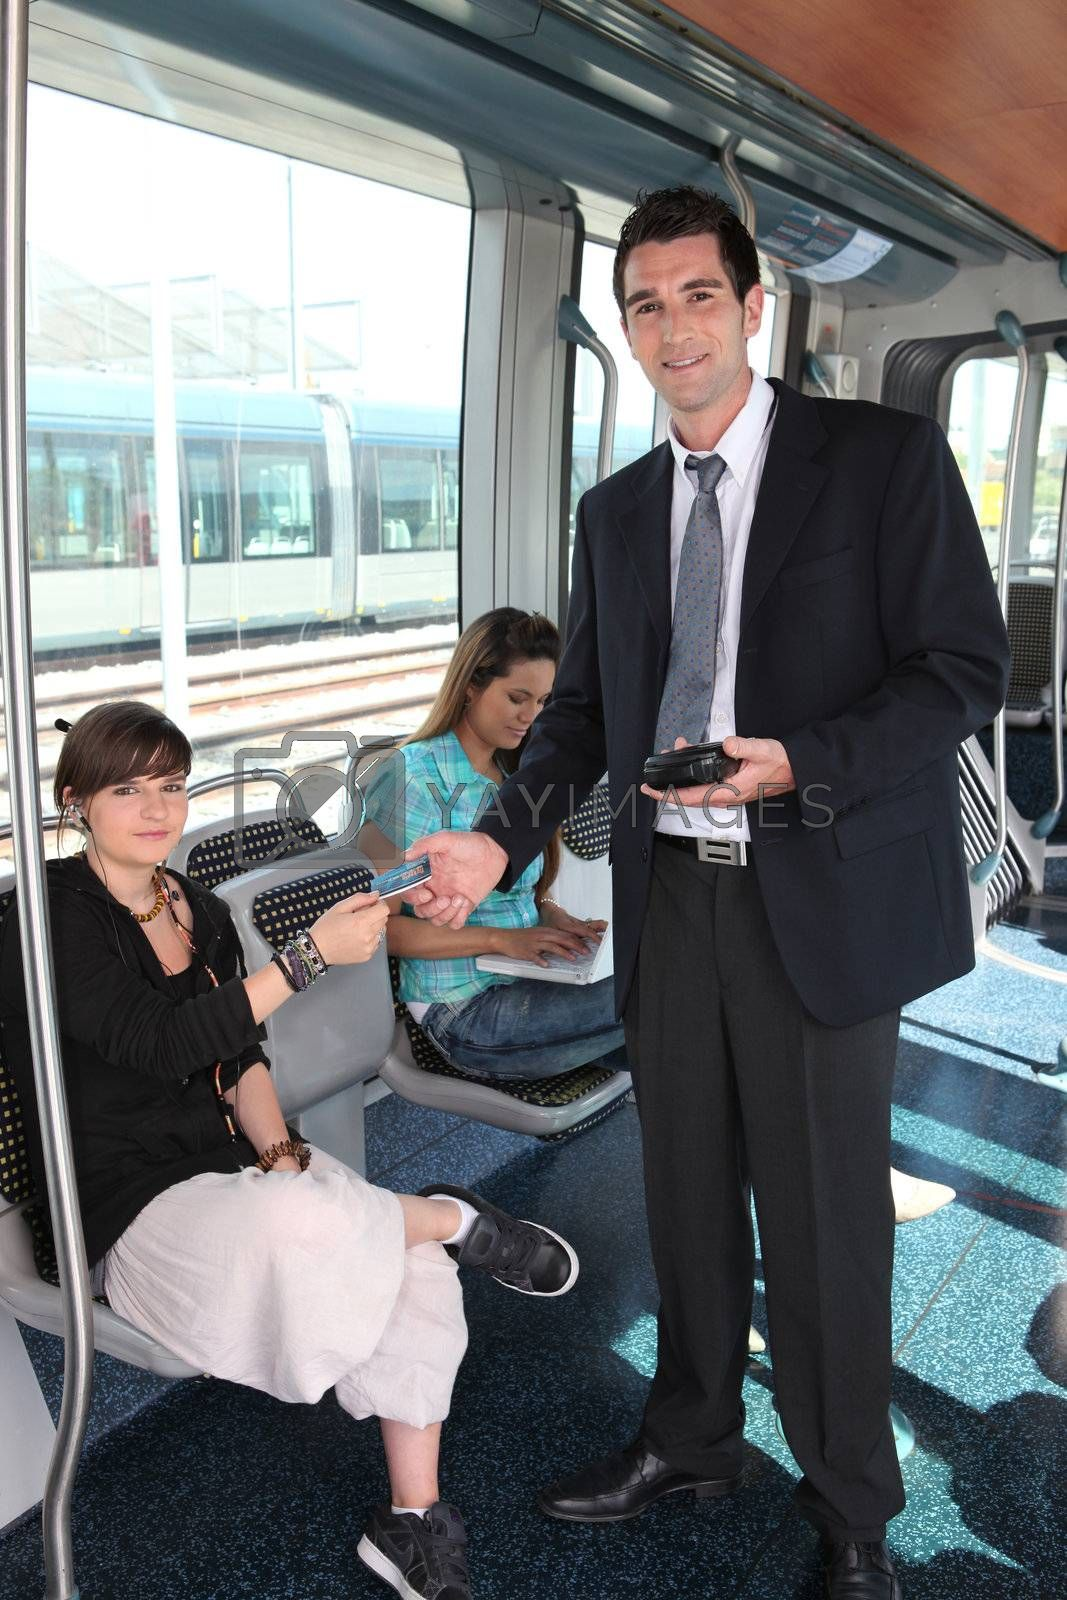 Man checking tram tickets